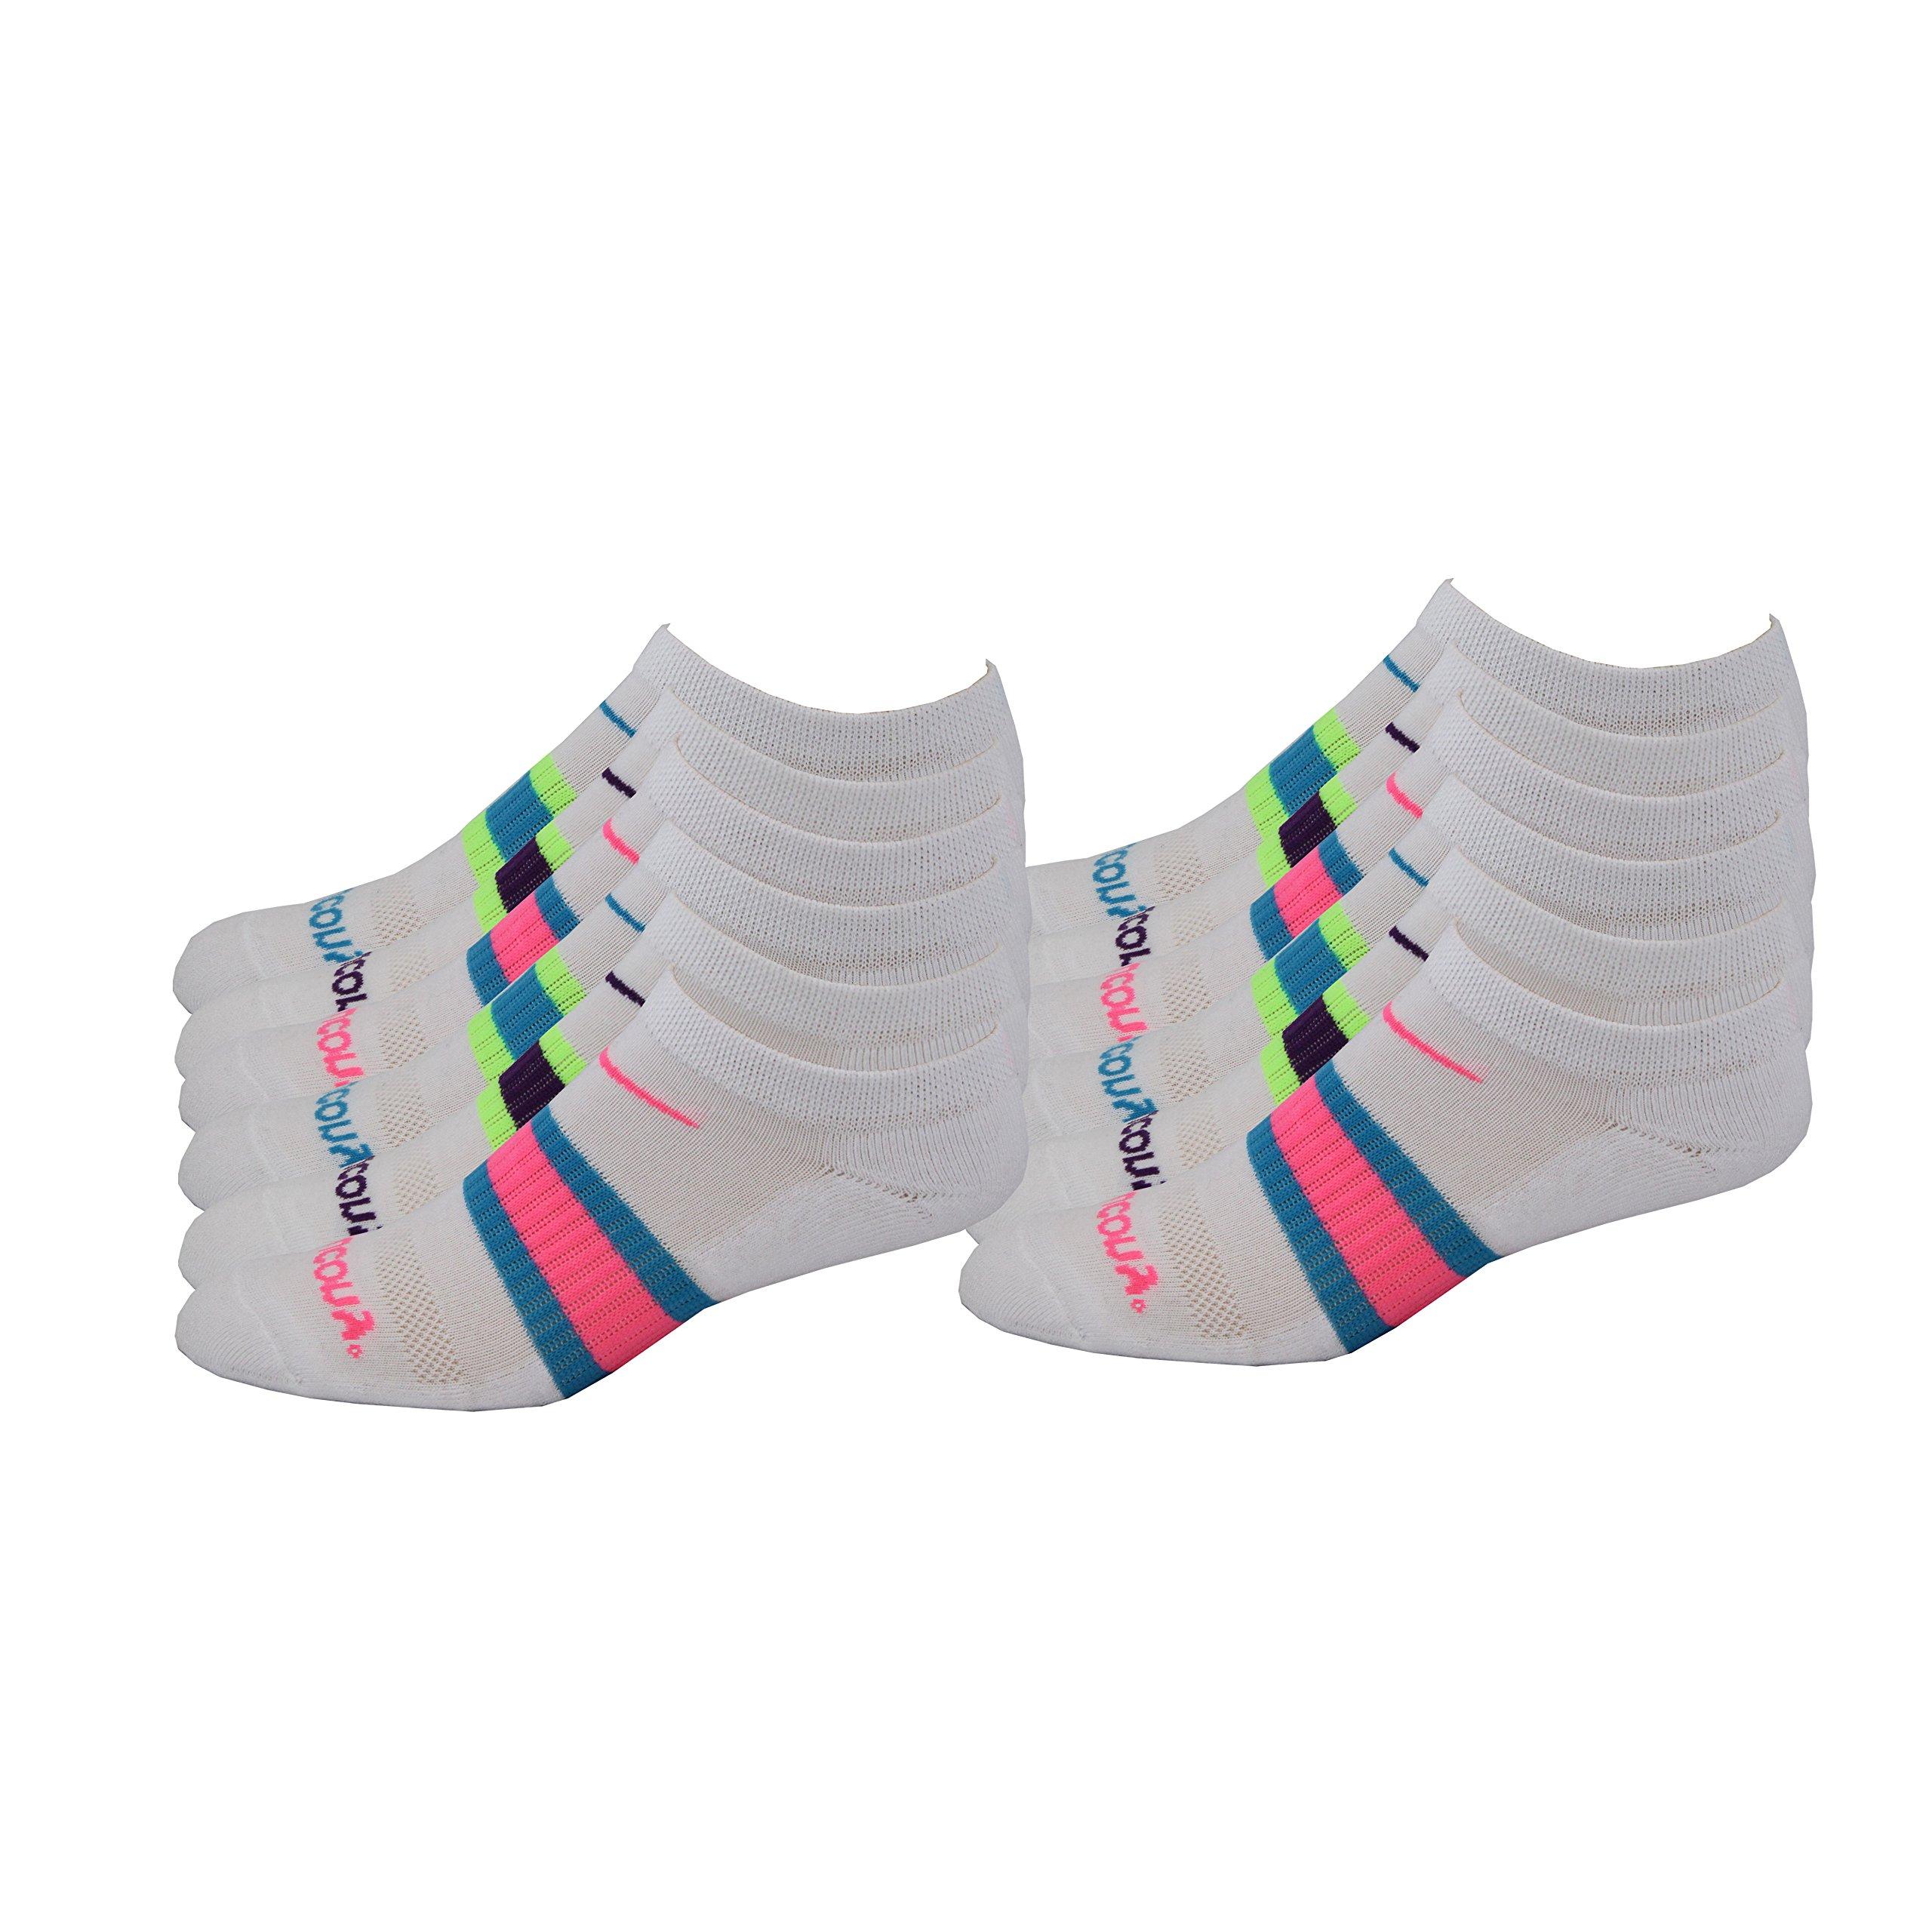 Saucony Women's Performance Arch Stripe No Show Socks, White Asst, W 6-10.5 Shoe, 12 Pair